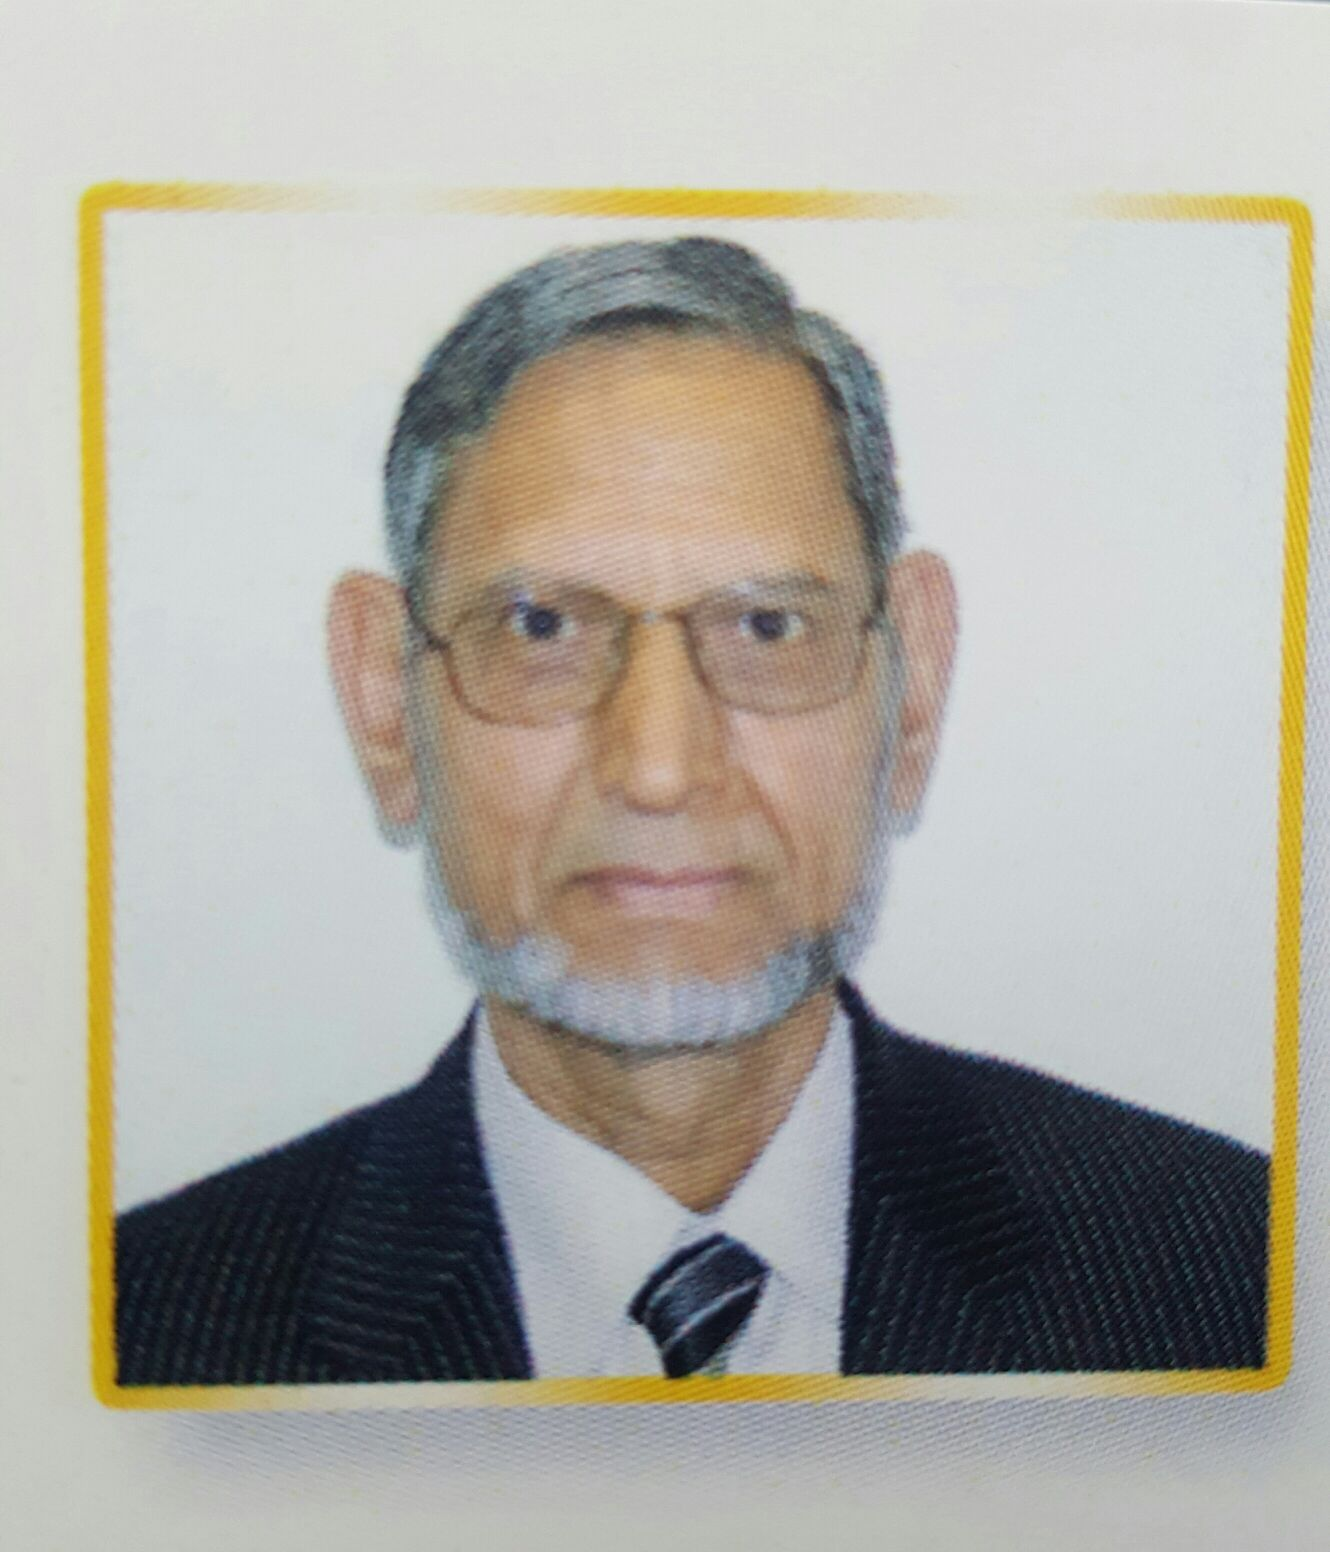 Abdul Chaudhary